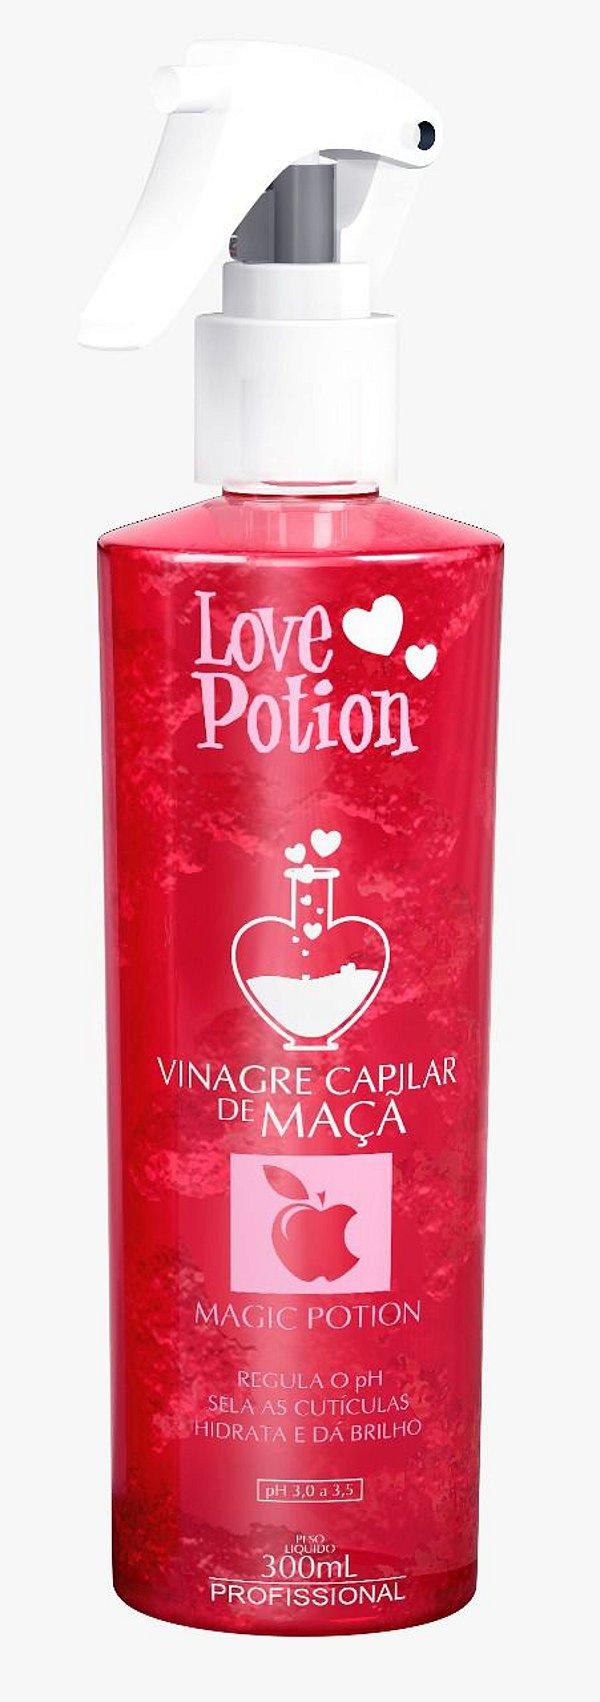 VINAGRE CAPILAR DE MAÇA 300ml - LOVE POTION